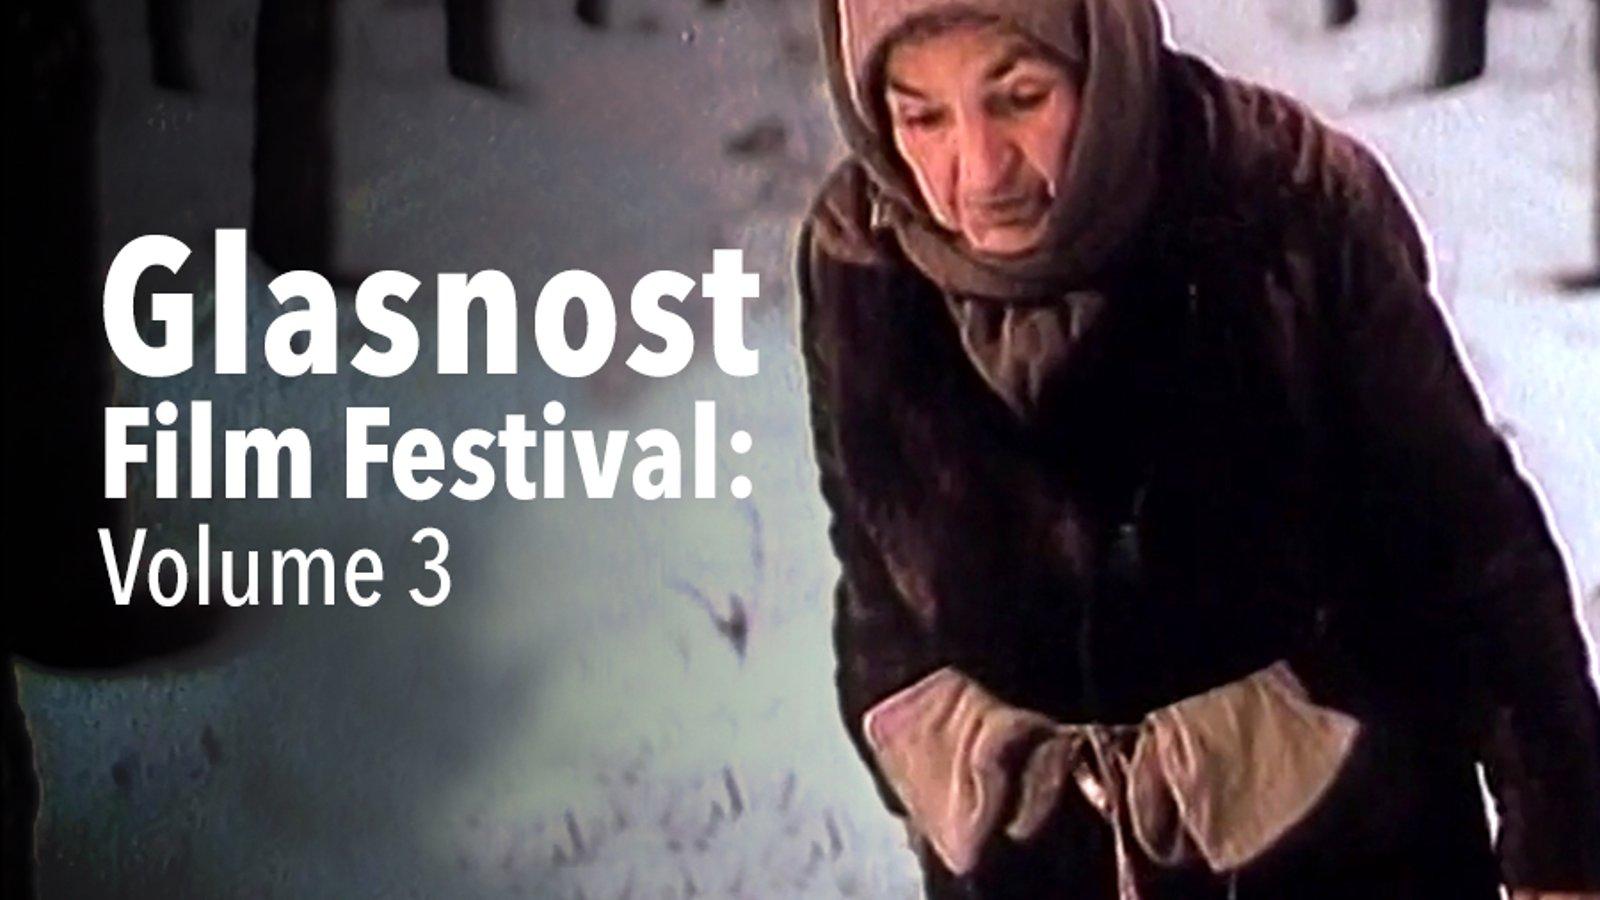 Glasnost Film Festival - Volume 3